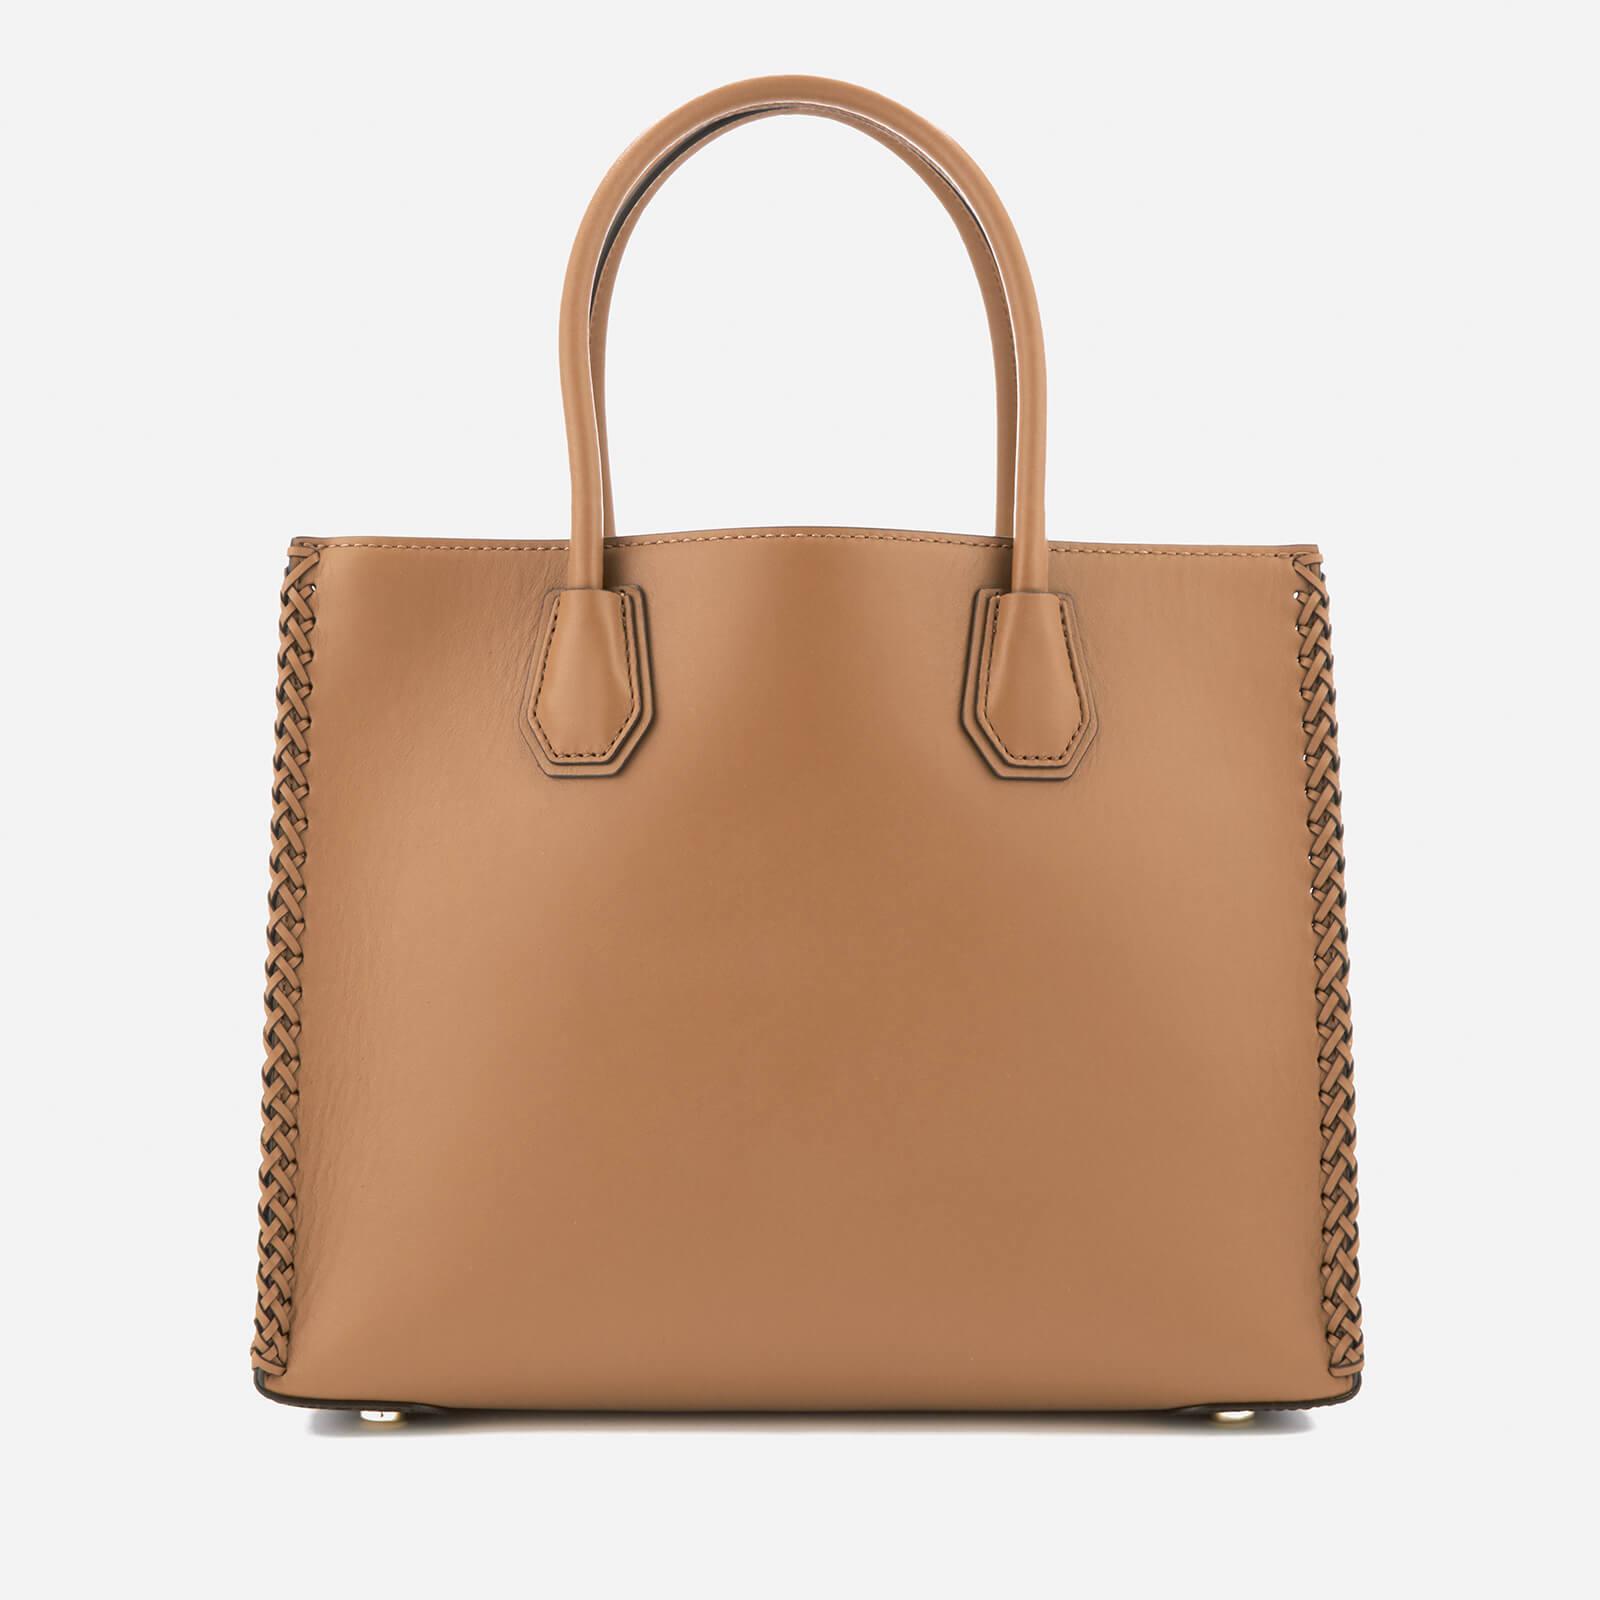 947e8b2f1d77 MICHAEL Michael Kors Mercer Patchwork Large Conversational Tote Bag ...